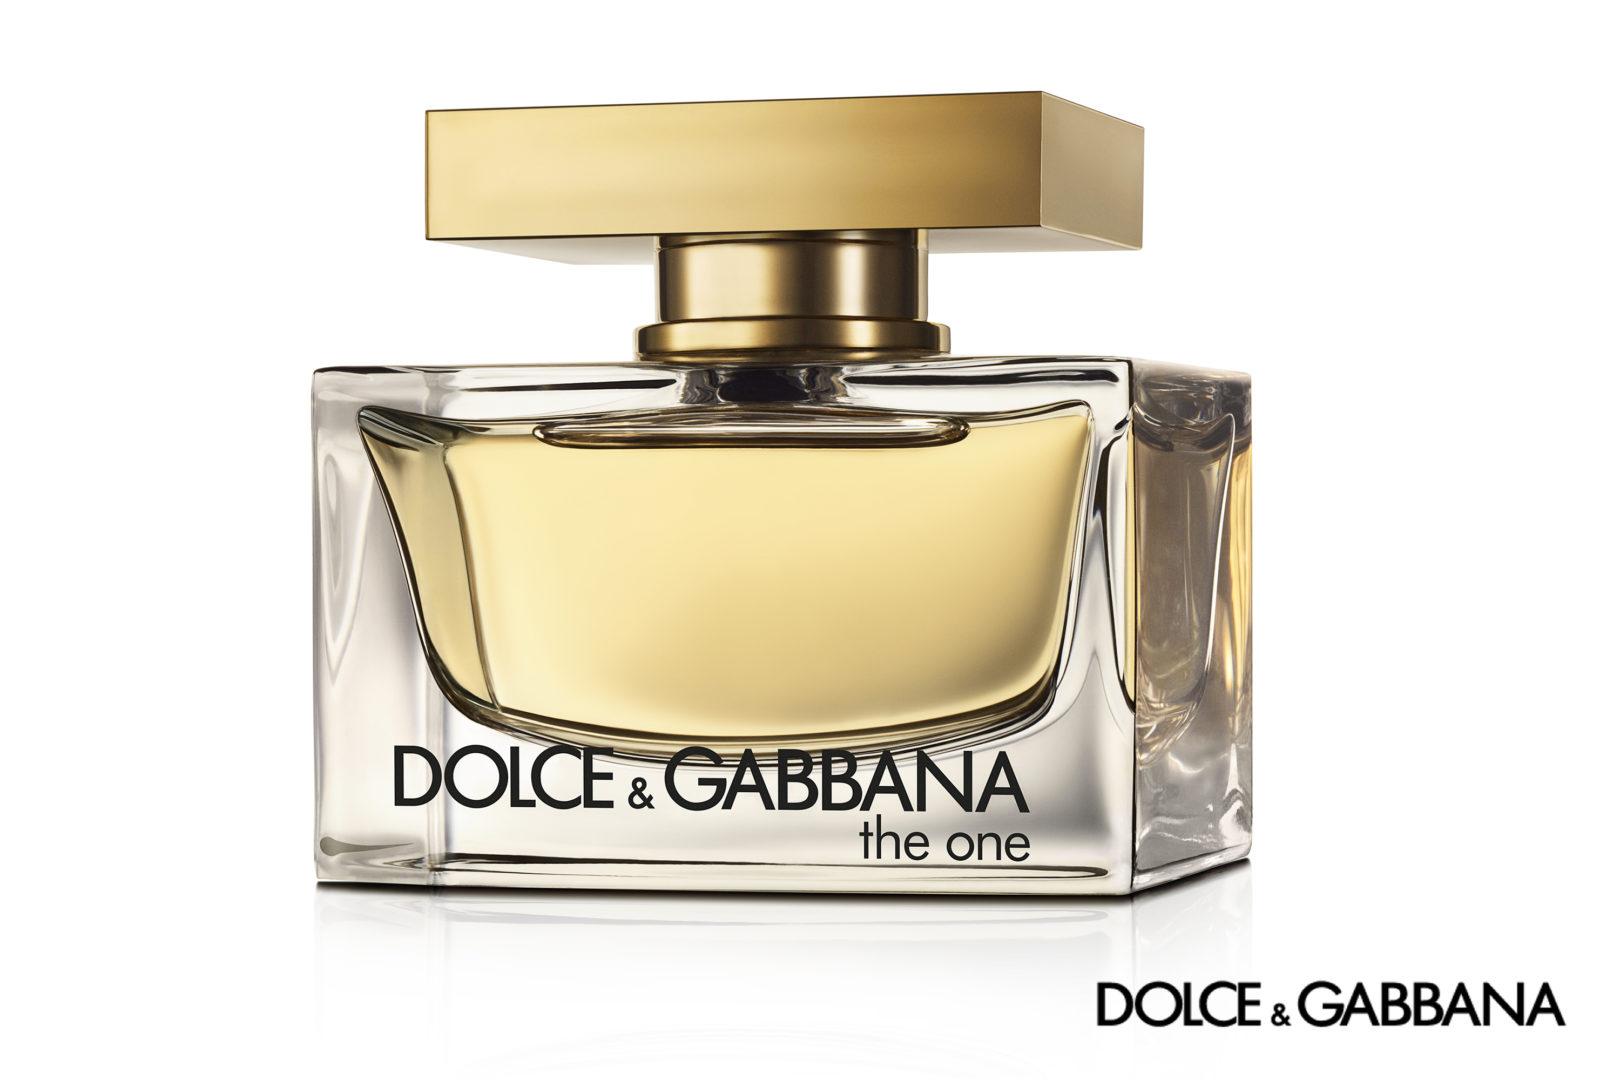 Dolce Gabbana Parfum bottle the one